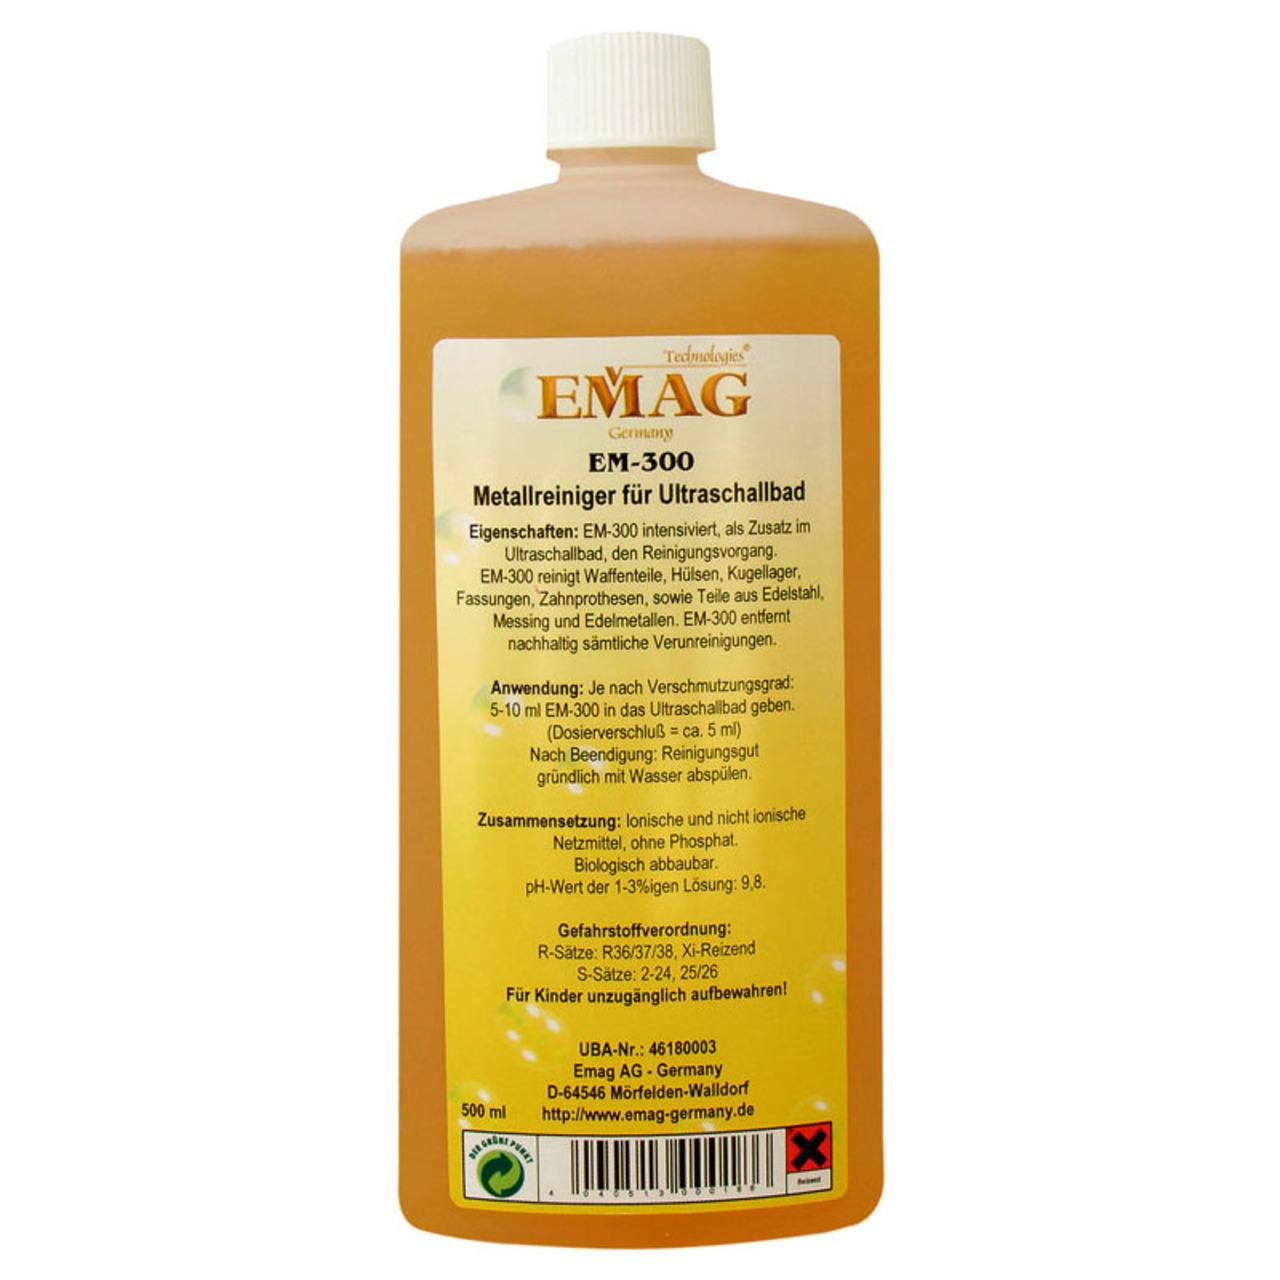 EMAG Metallreiniger EM-300- 500 ml